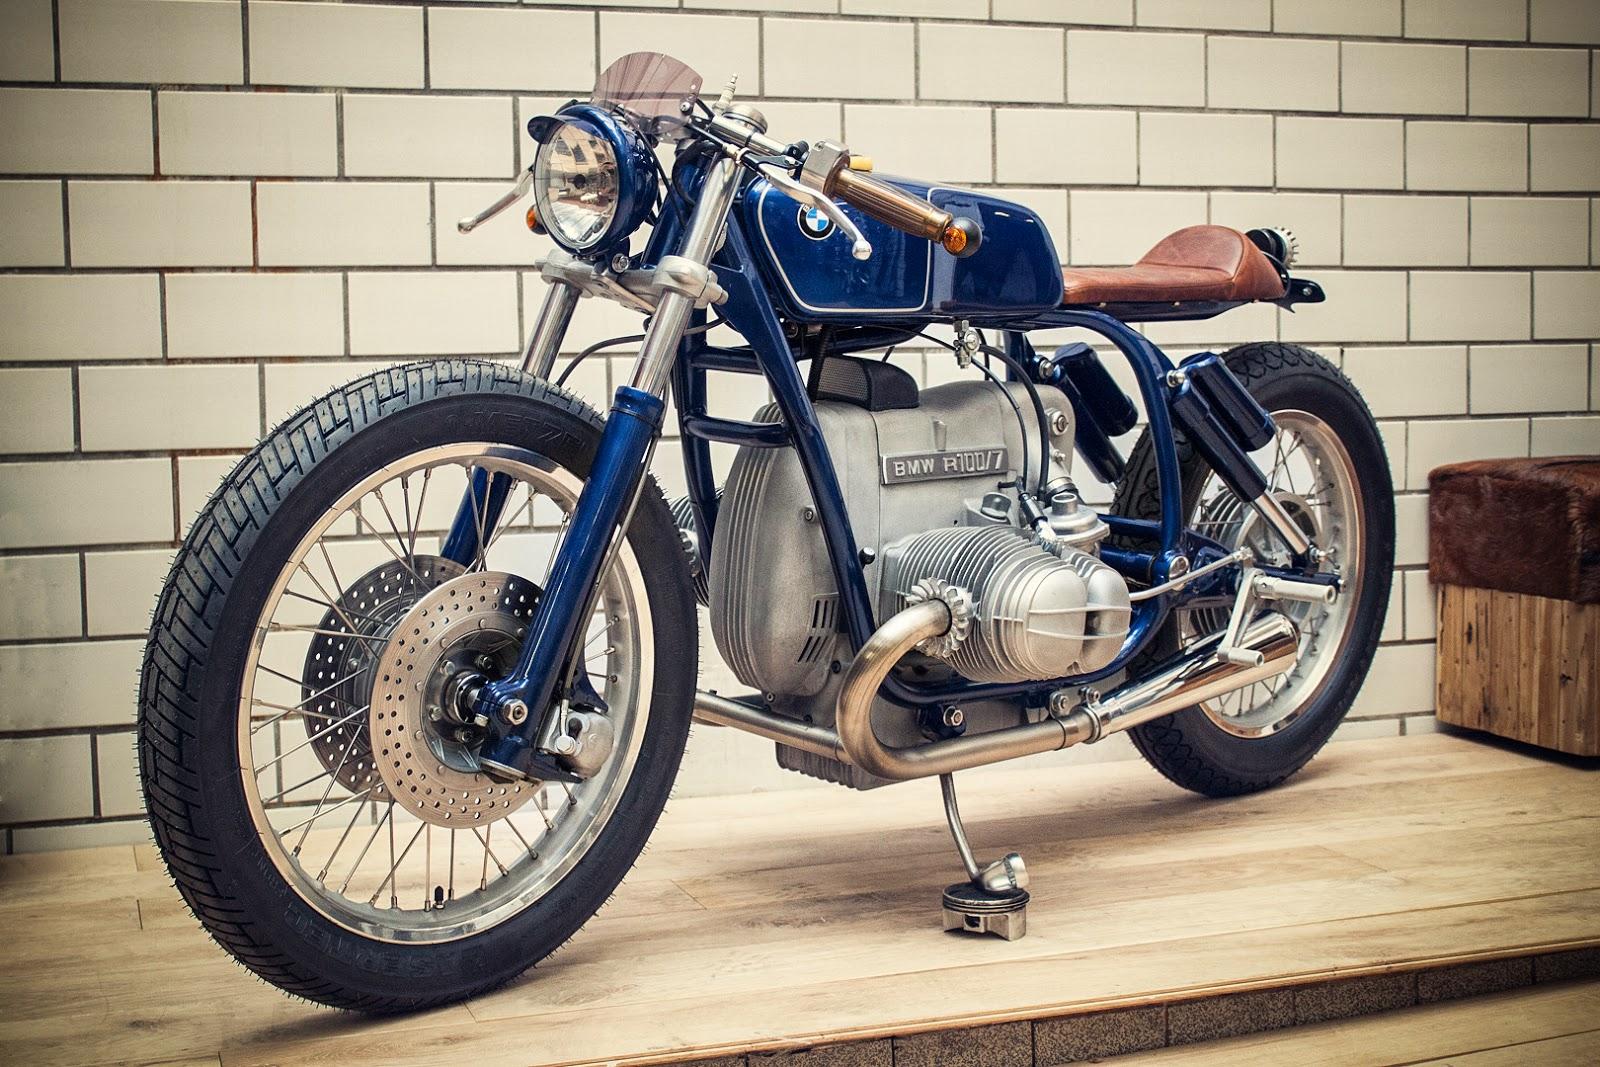 kingston custom motorcycles motorcycles. Black Bedroom Furniture Sets. Home Design Ideas